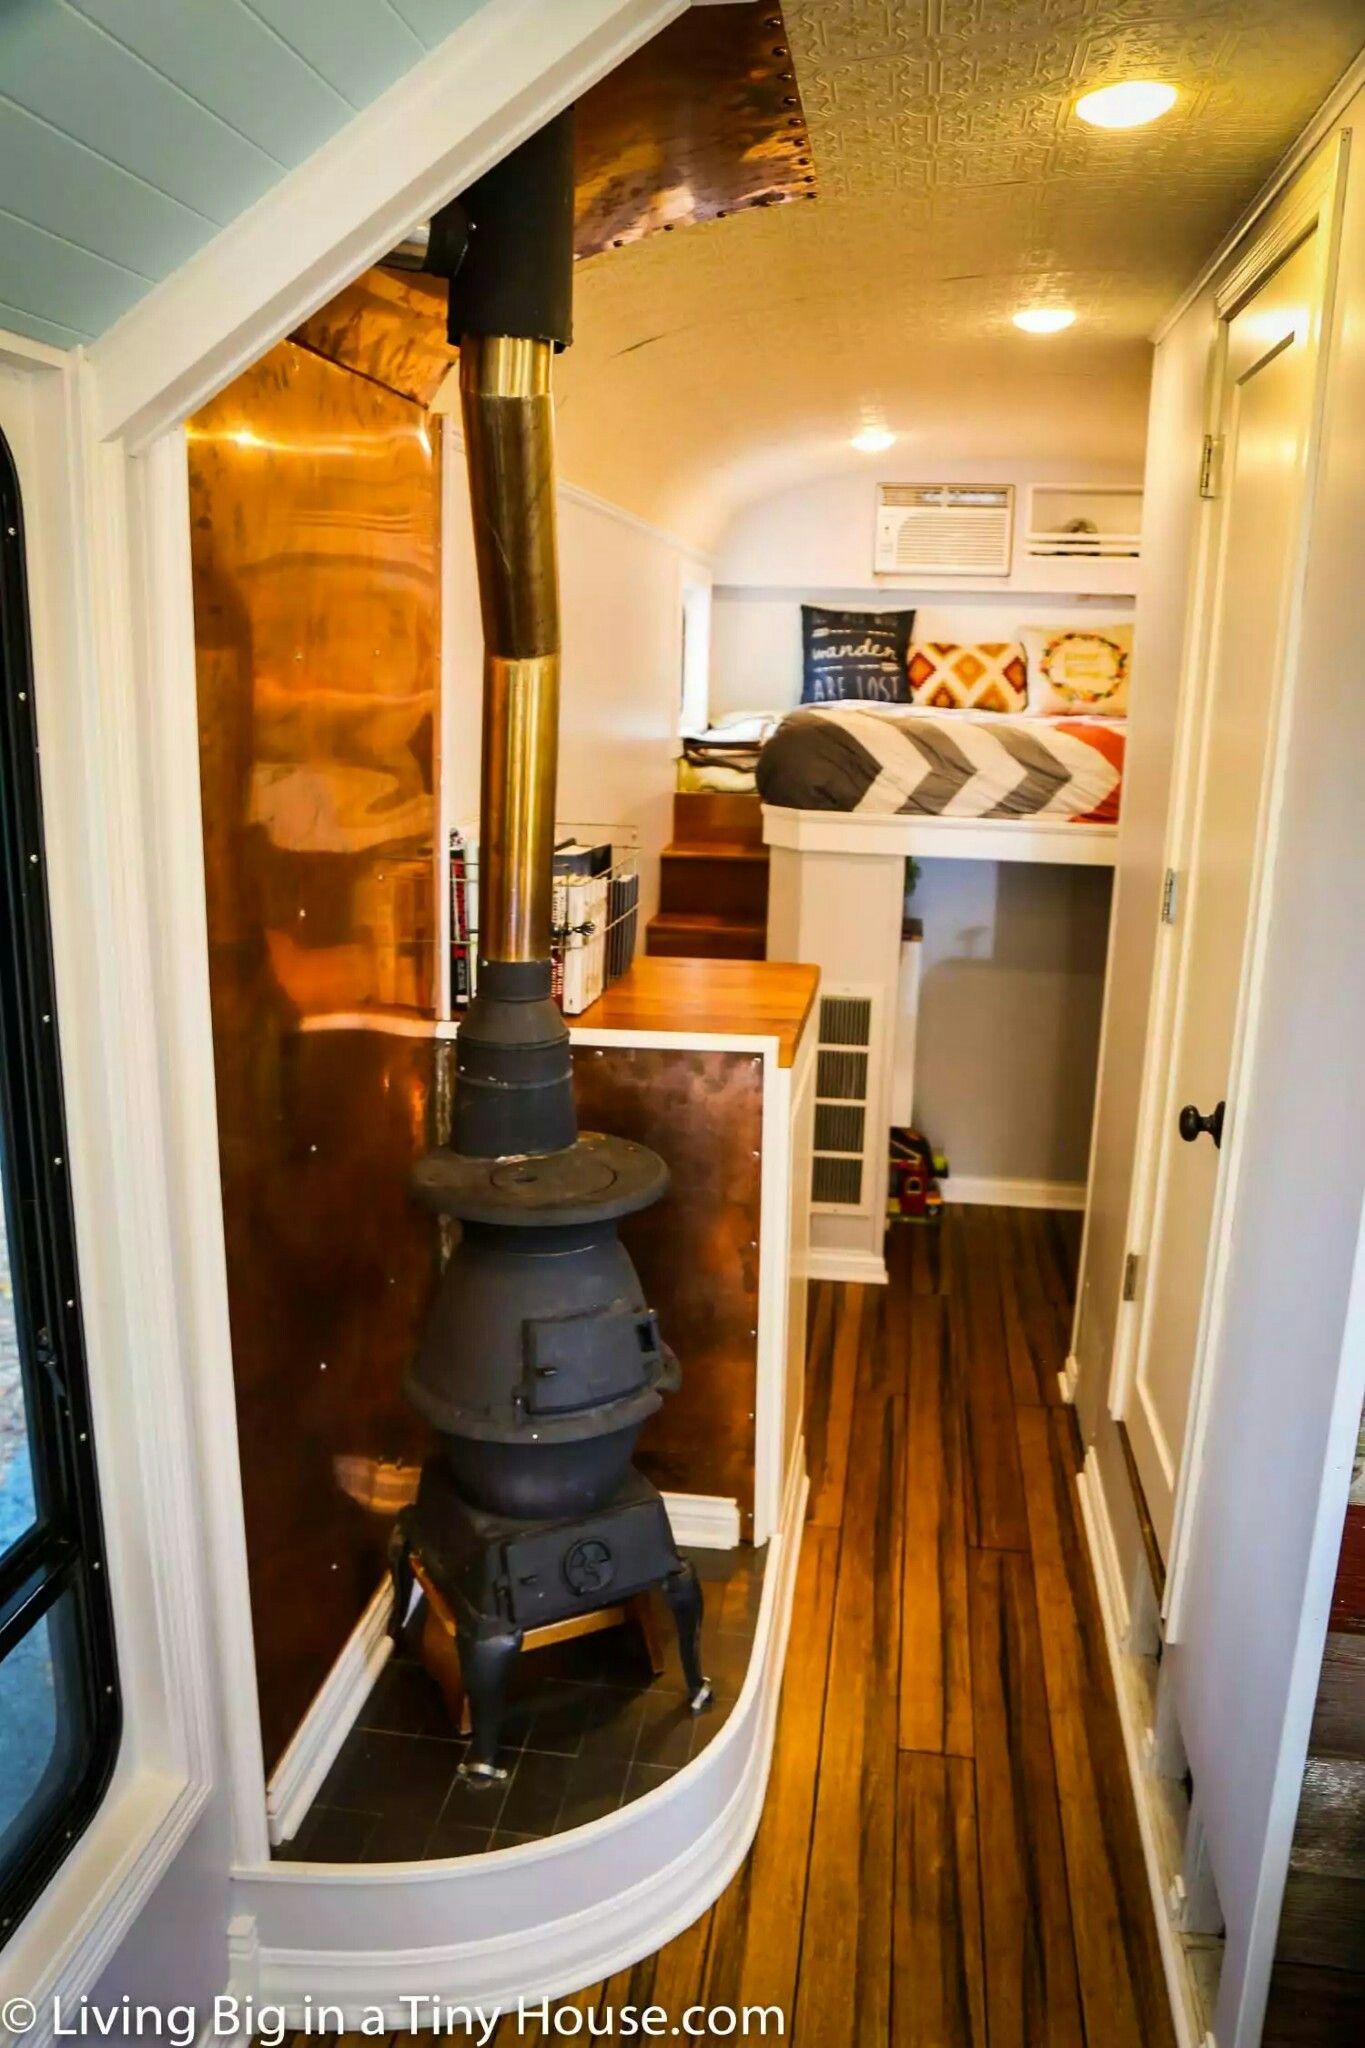 pingl par fiona powell sur make me this m f house pinterest roulotte fourgon. Black Bedroom Furniture Sets. Home Design Ideas